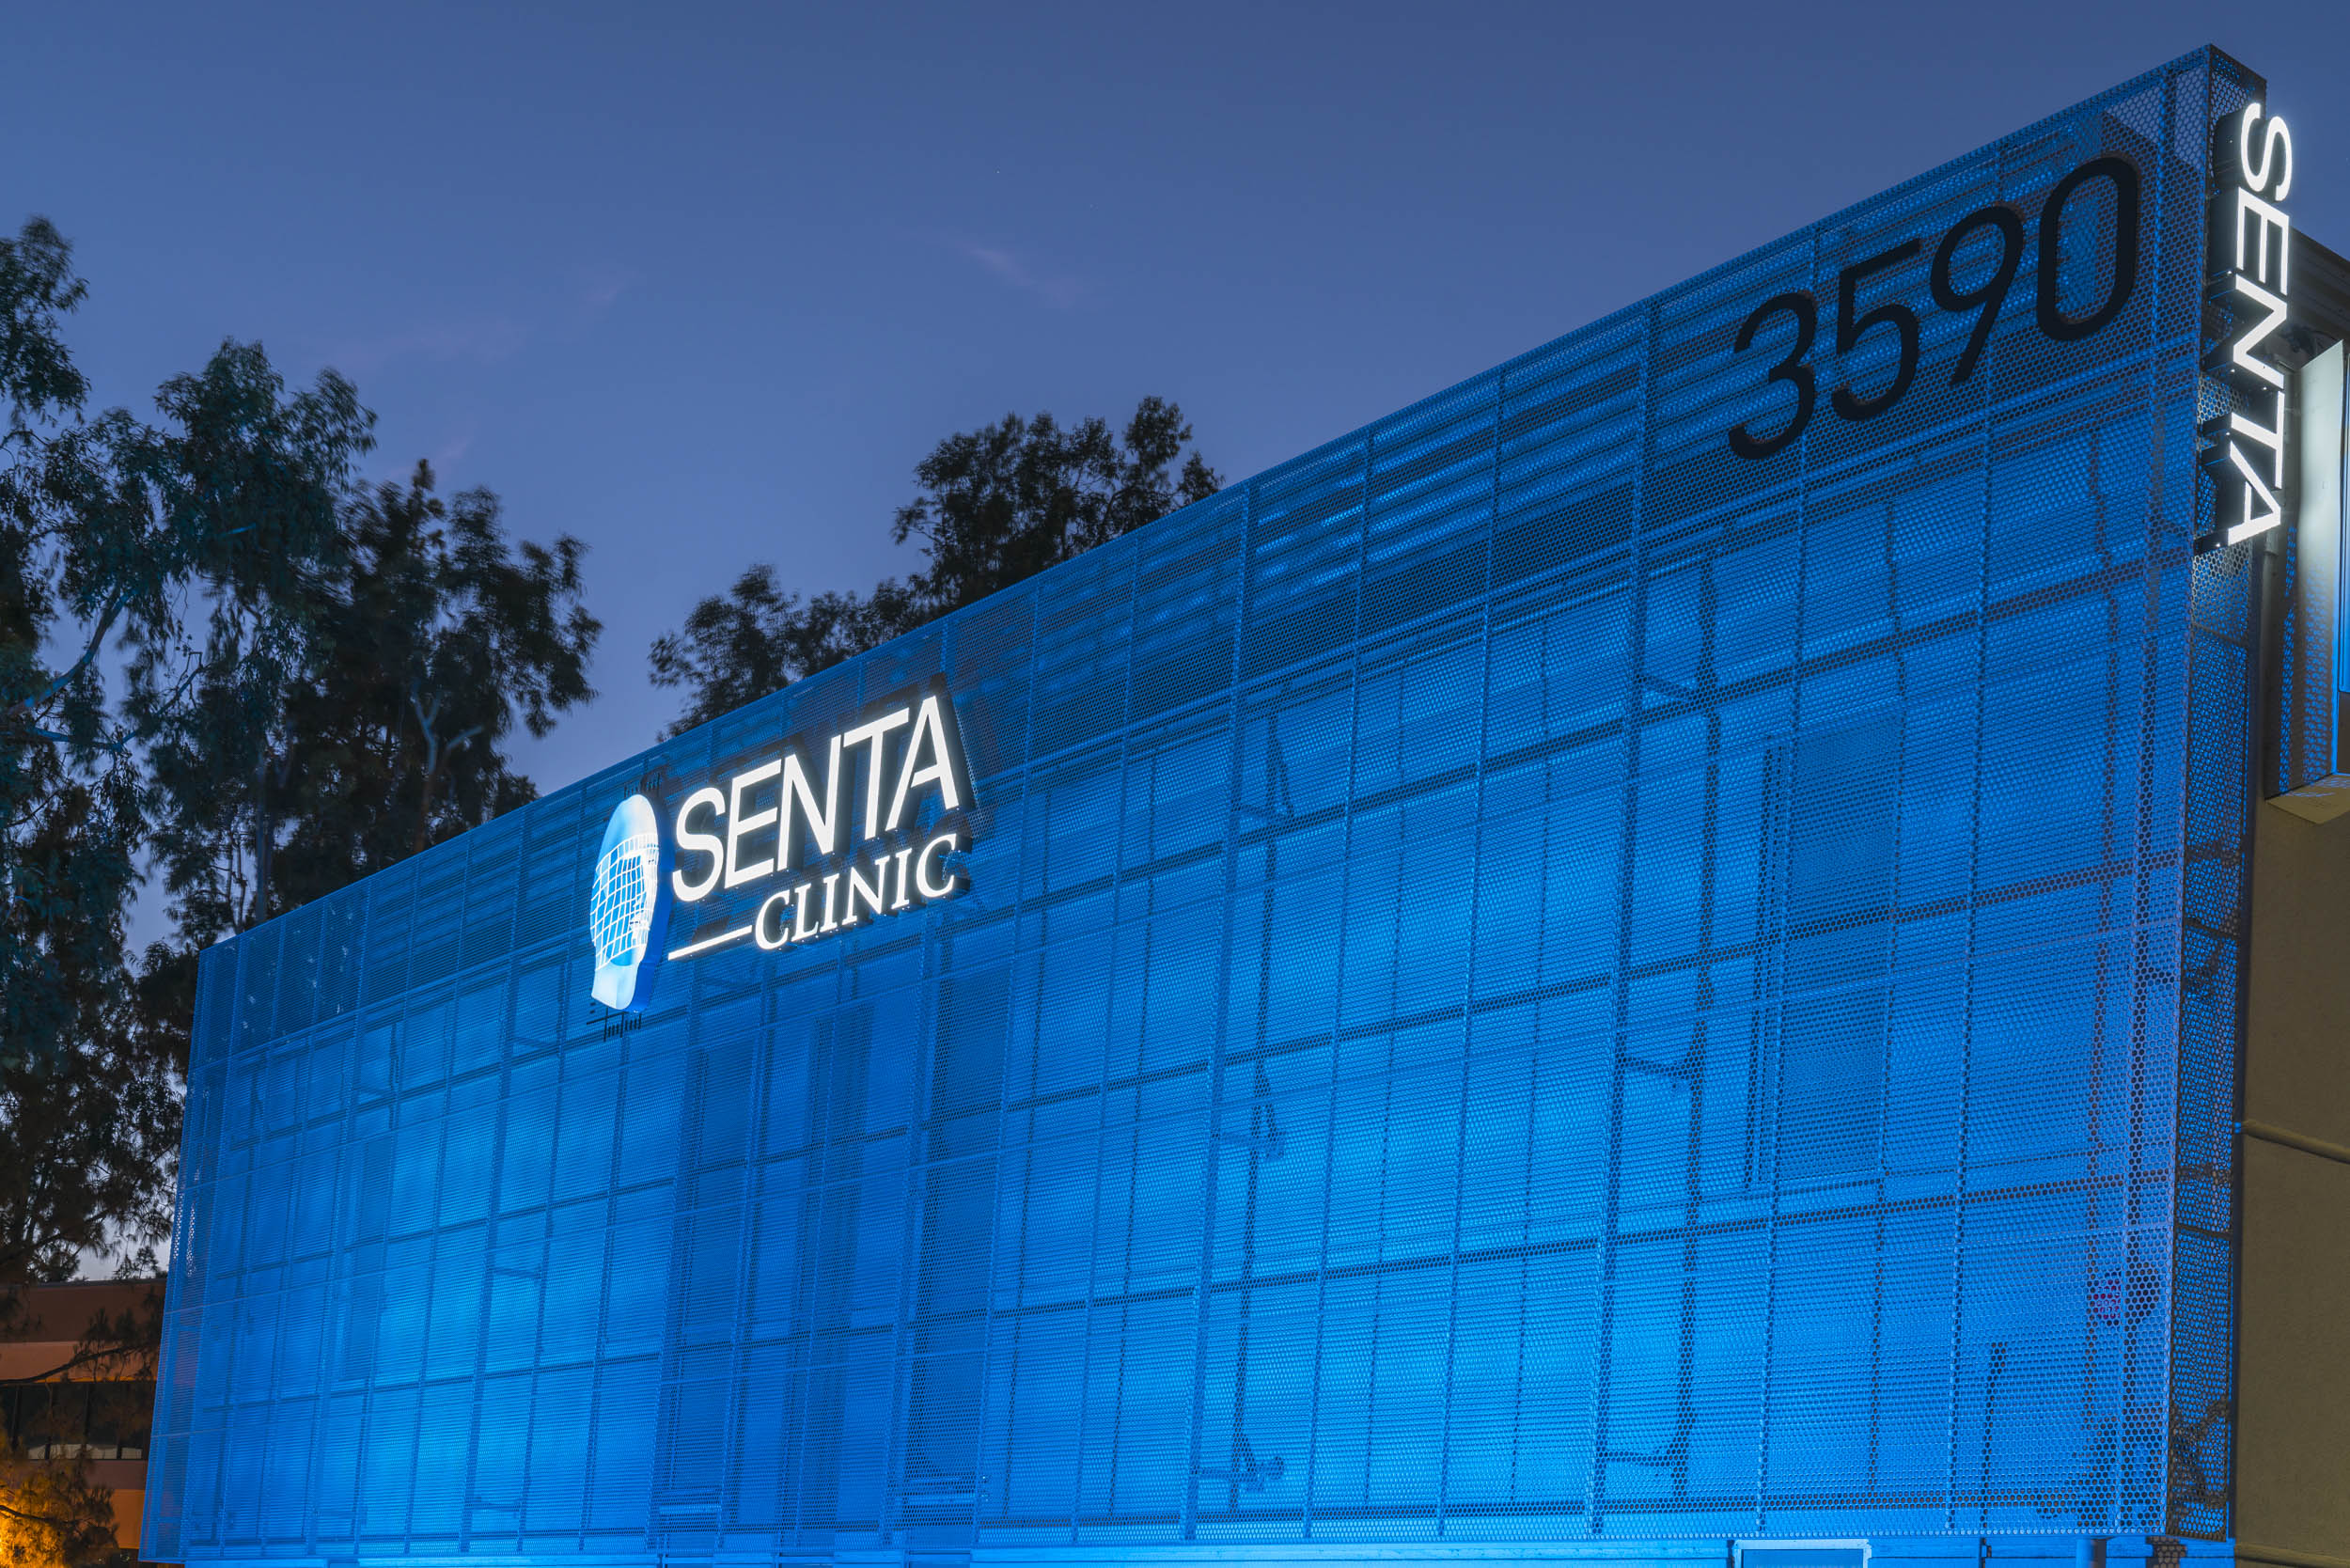 Senta Clinic Exterior Web Res-8928.JPG